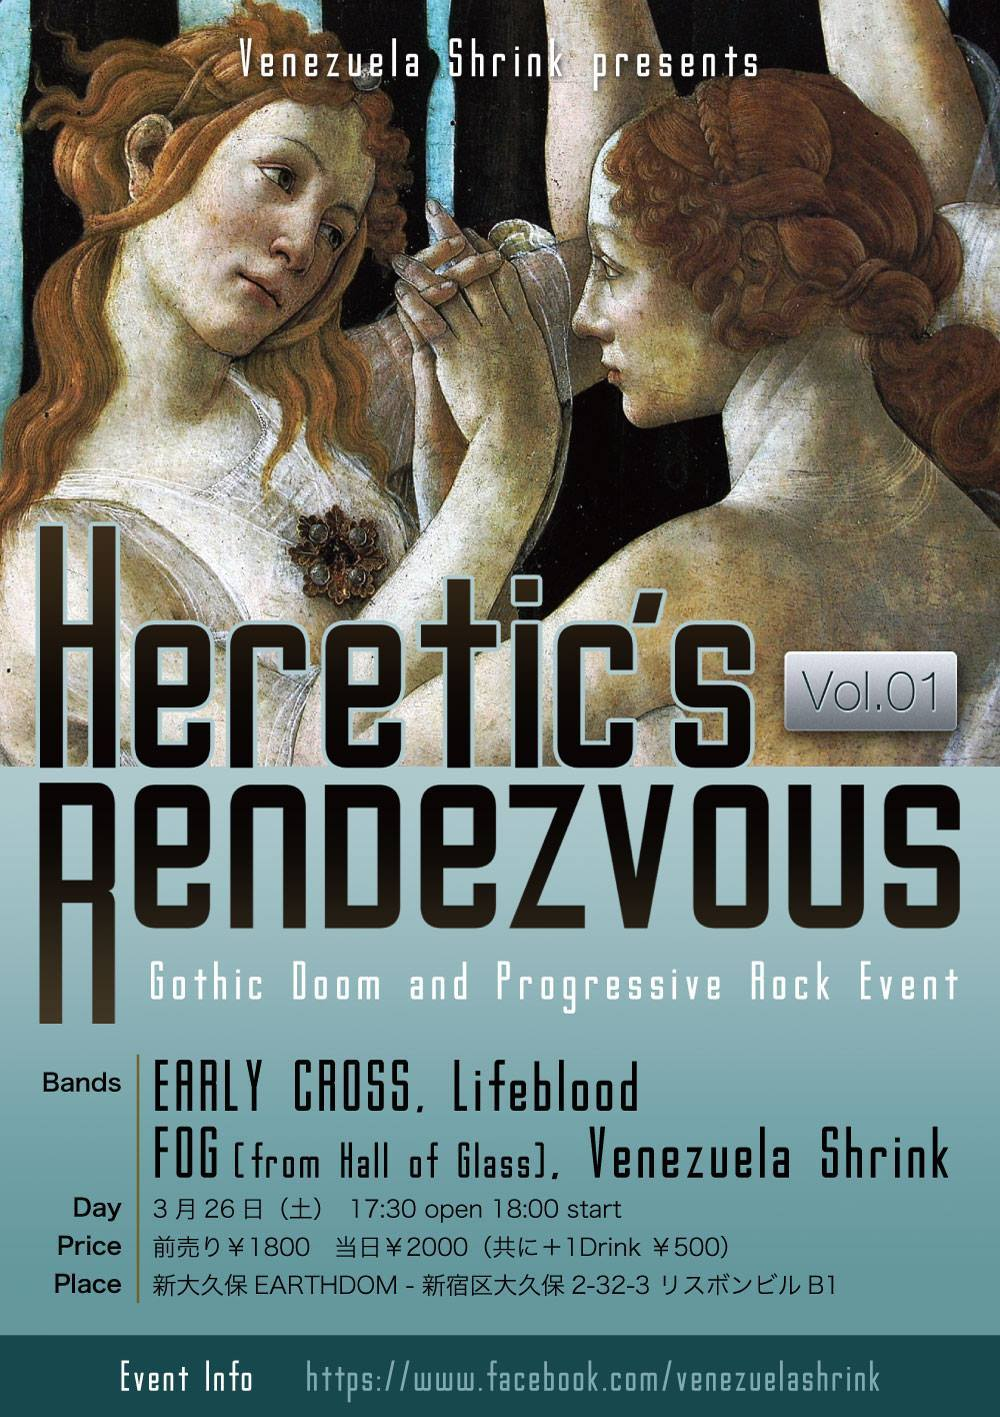 Heretics Rendezvous vol1